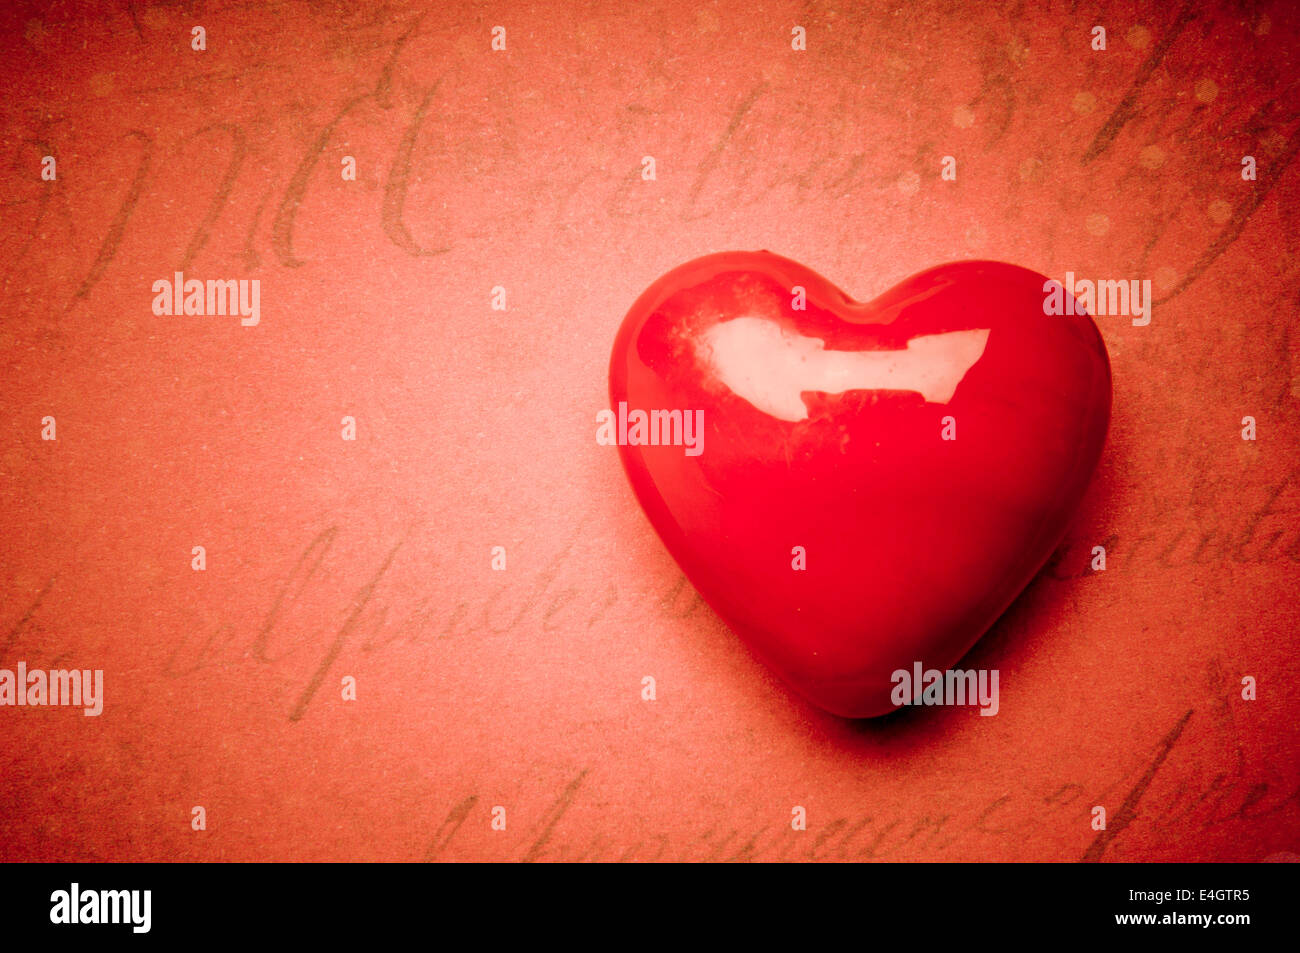 Liebesherz, Liebe Konzept Stockbild